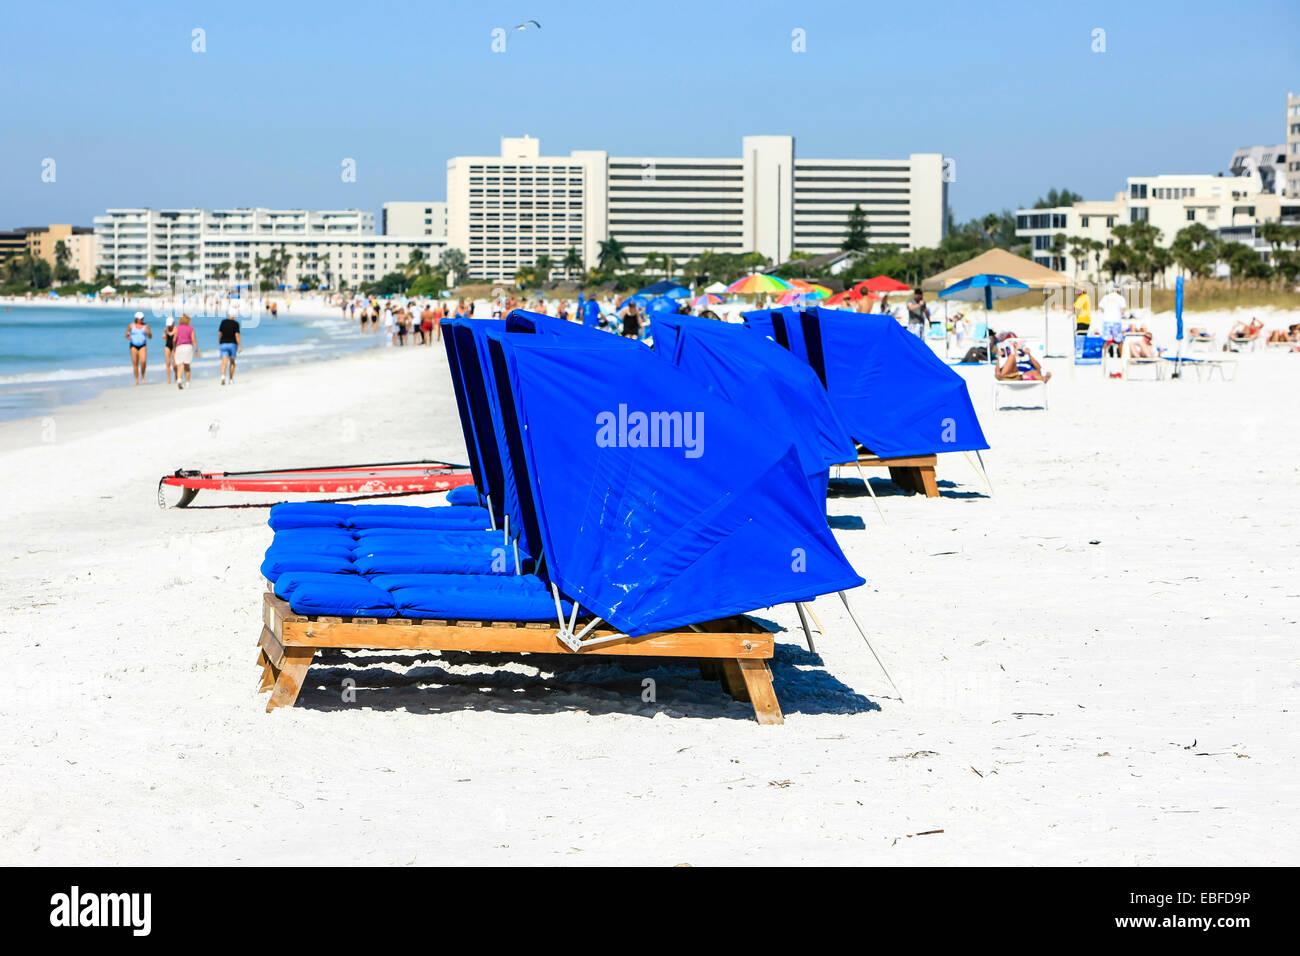 Blue beach Cabanas on Crescent beach on Siesta Key Island in Sarasota FL - Stock Image